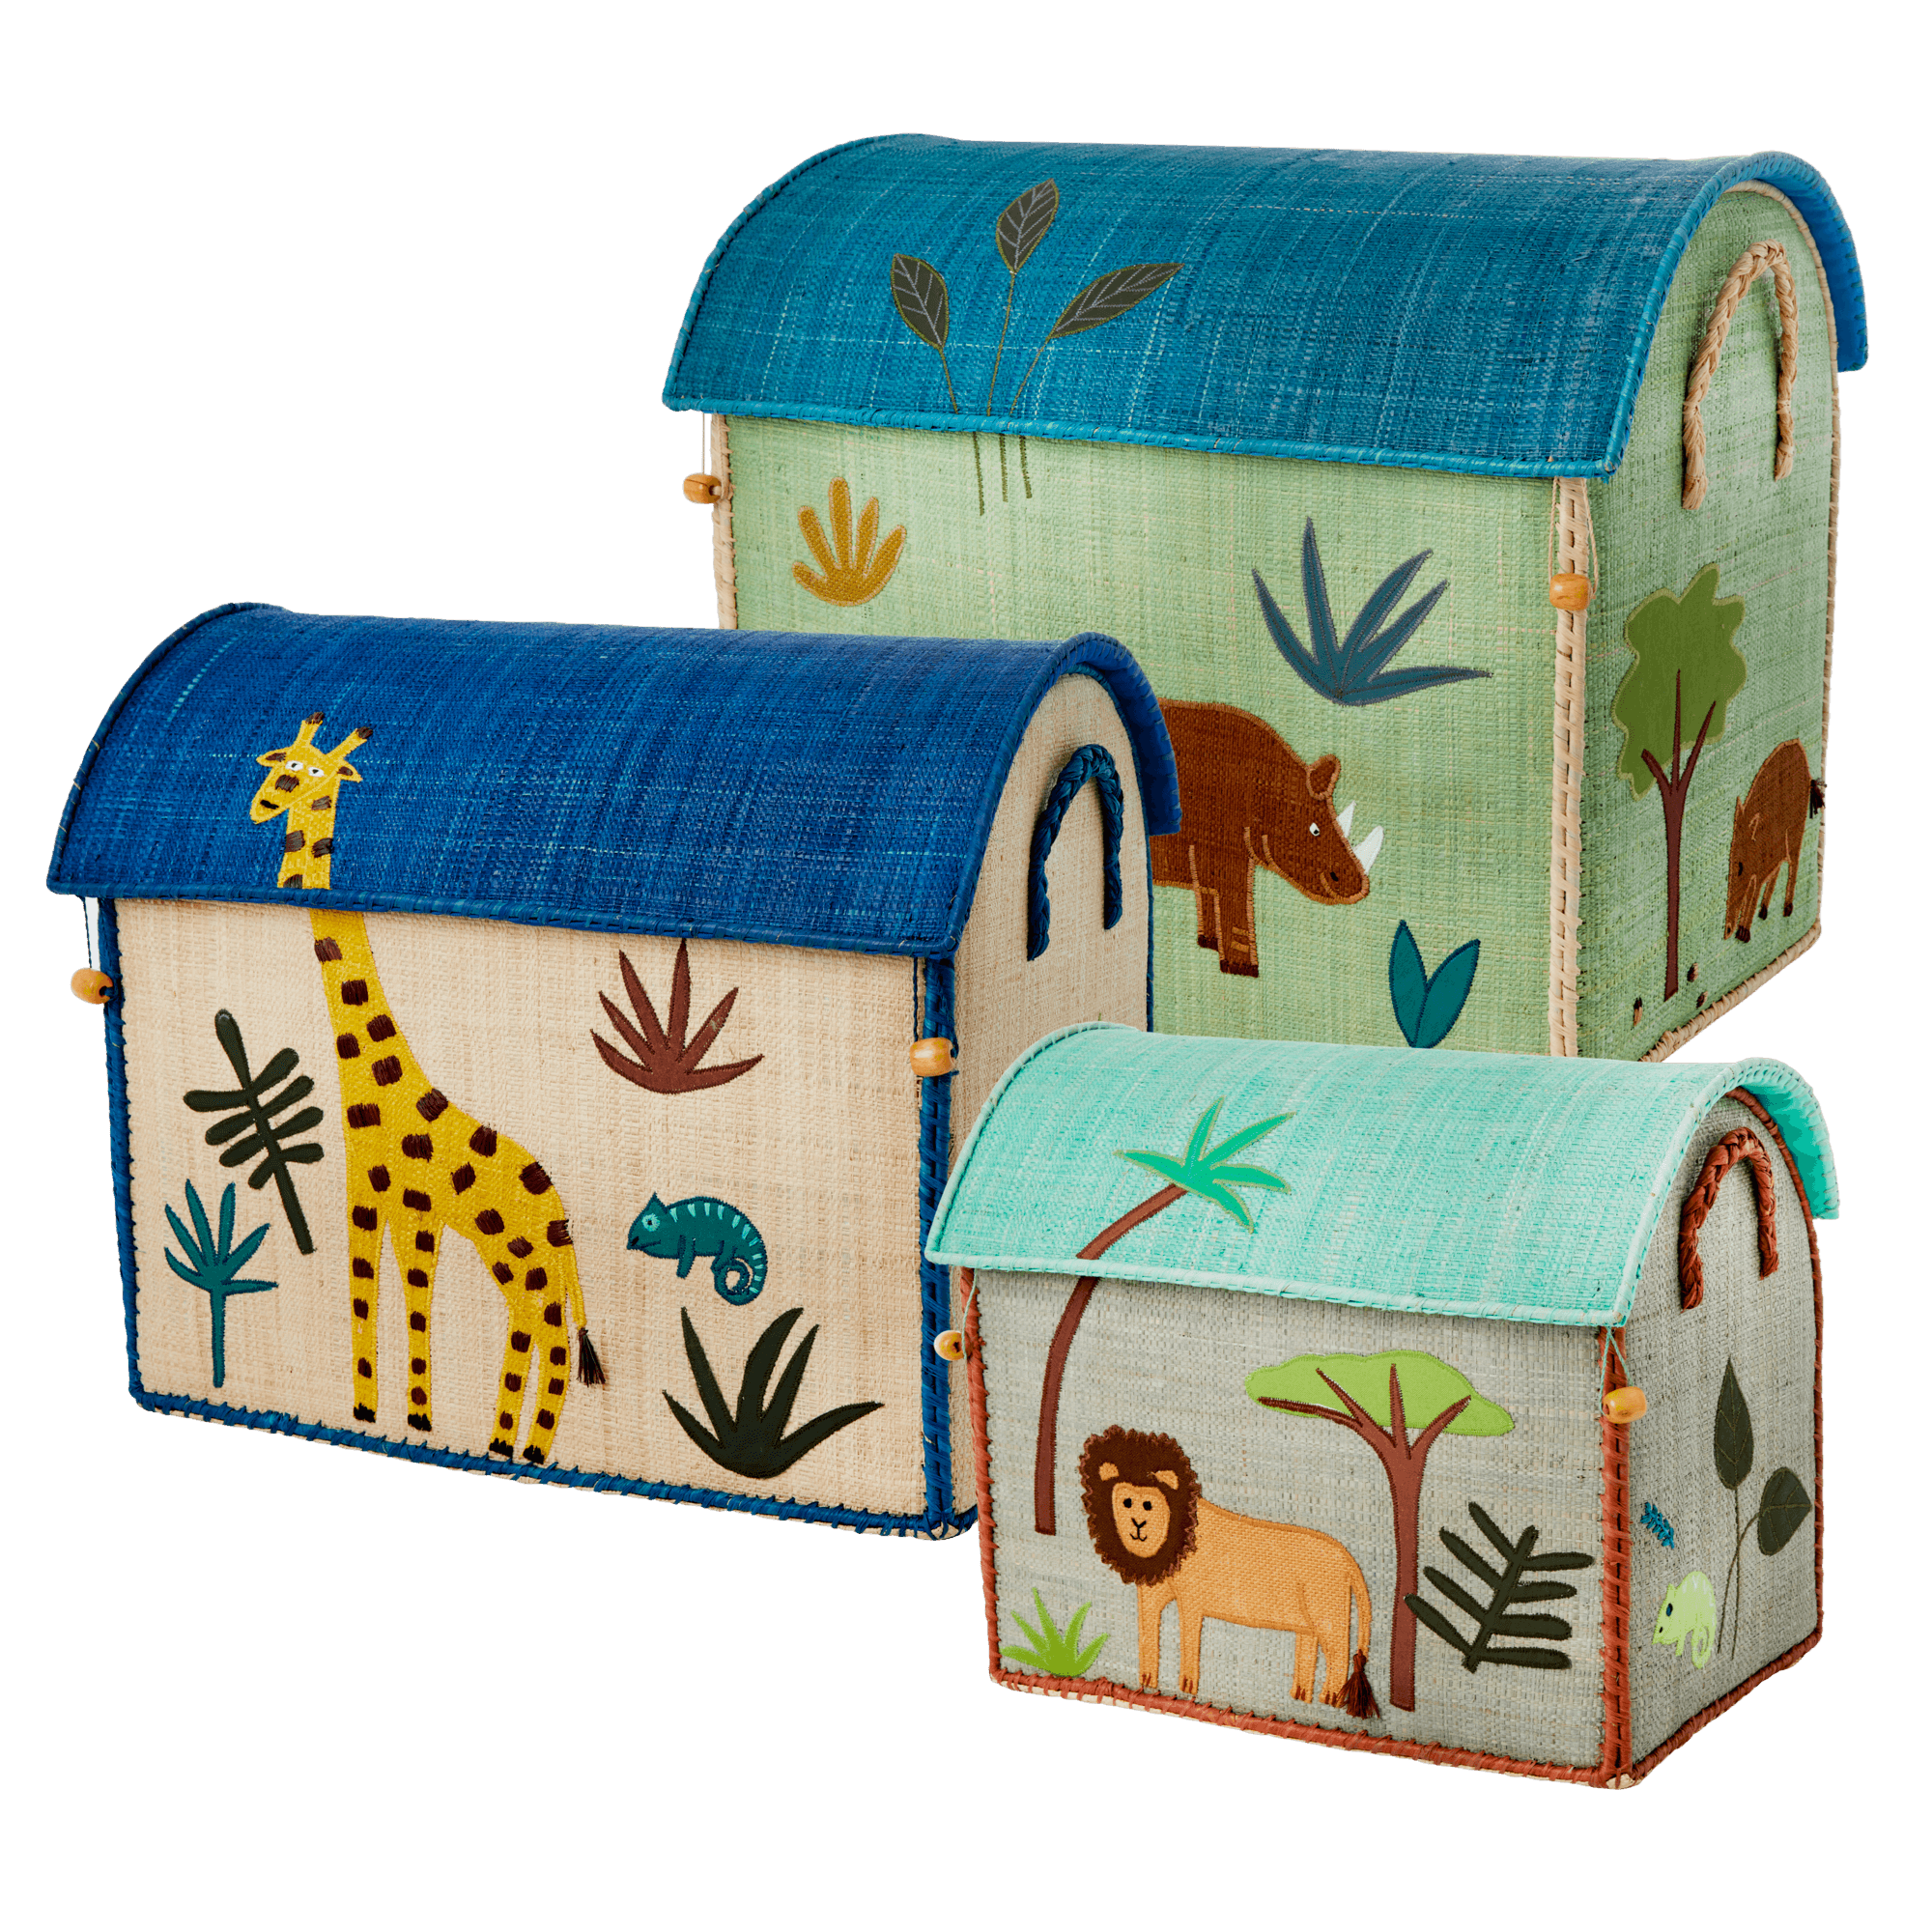 Rice - Large Set of 3 Toy Baskets - Blue Jungle Theme